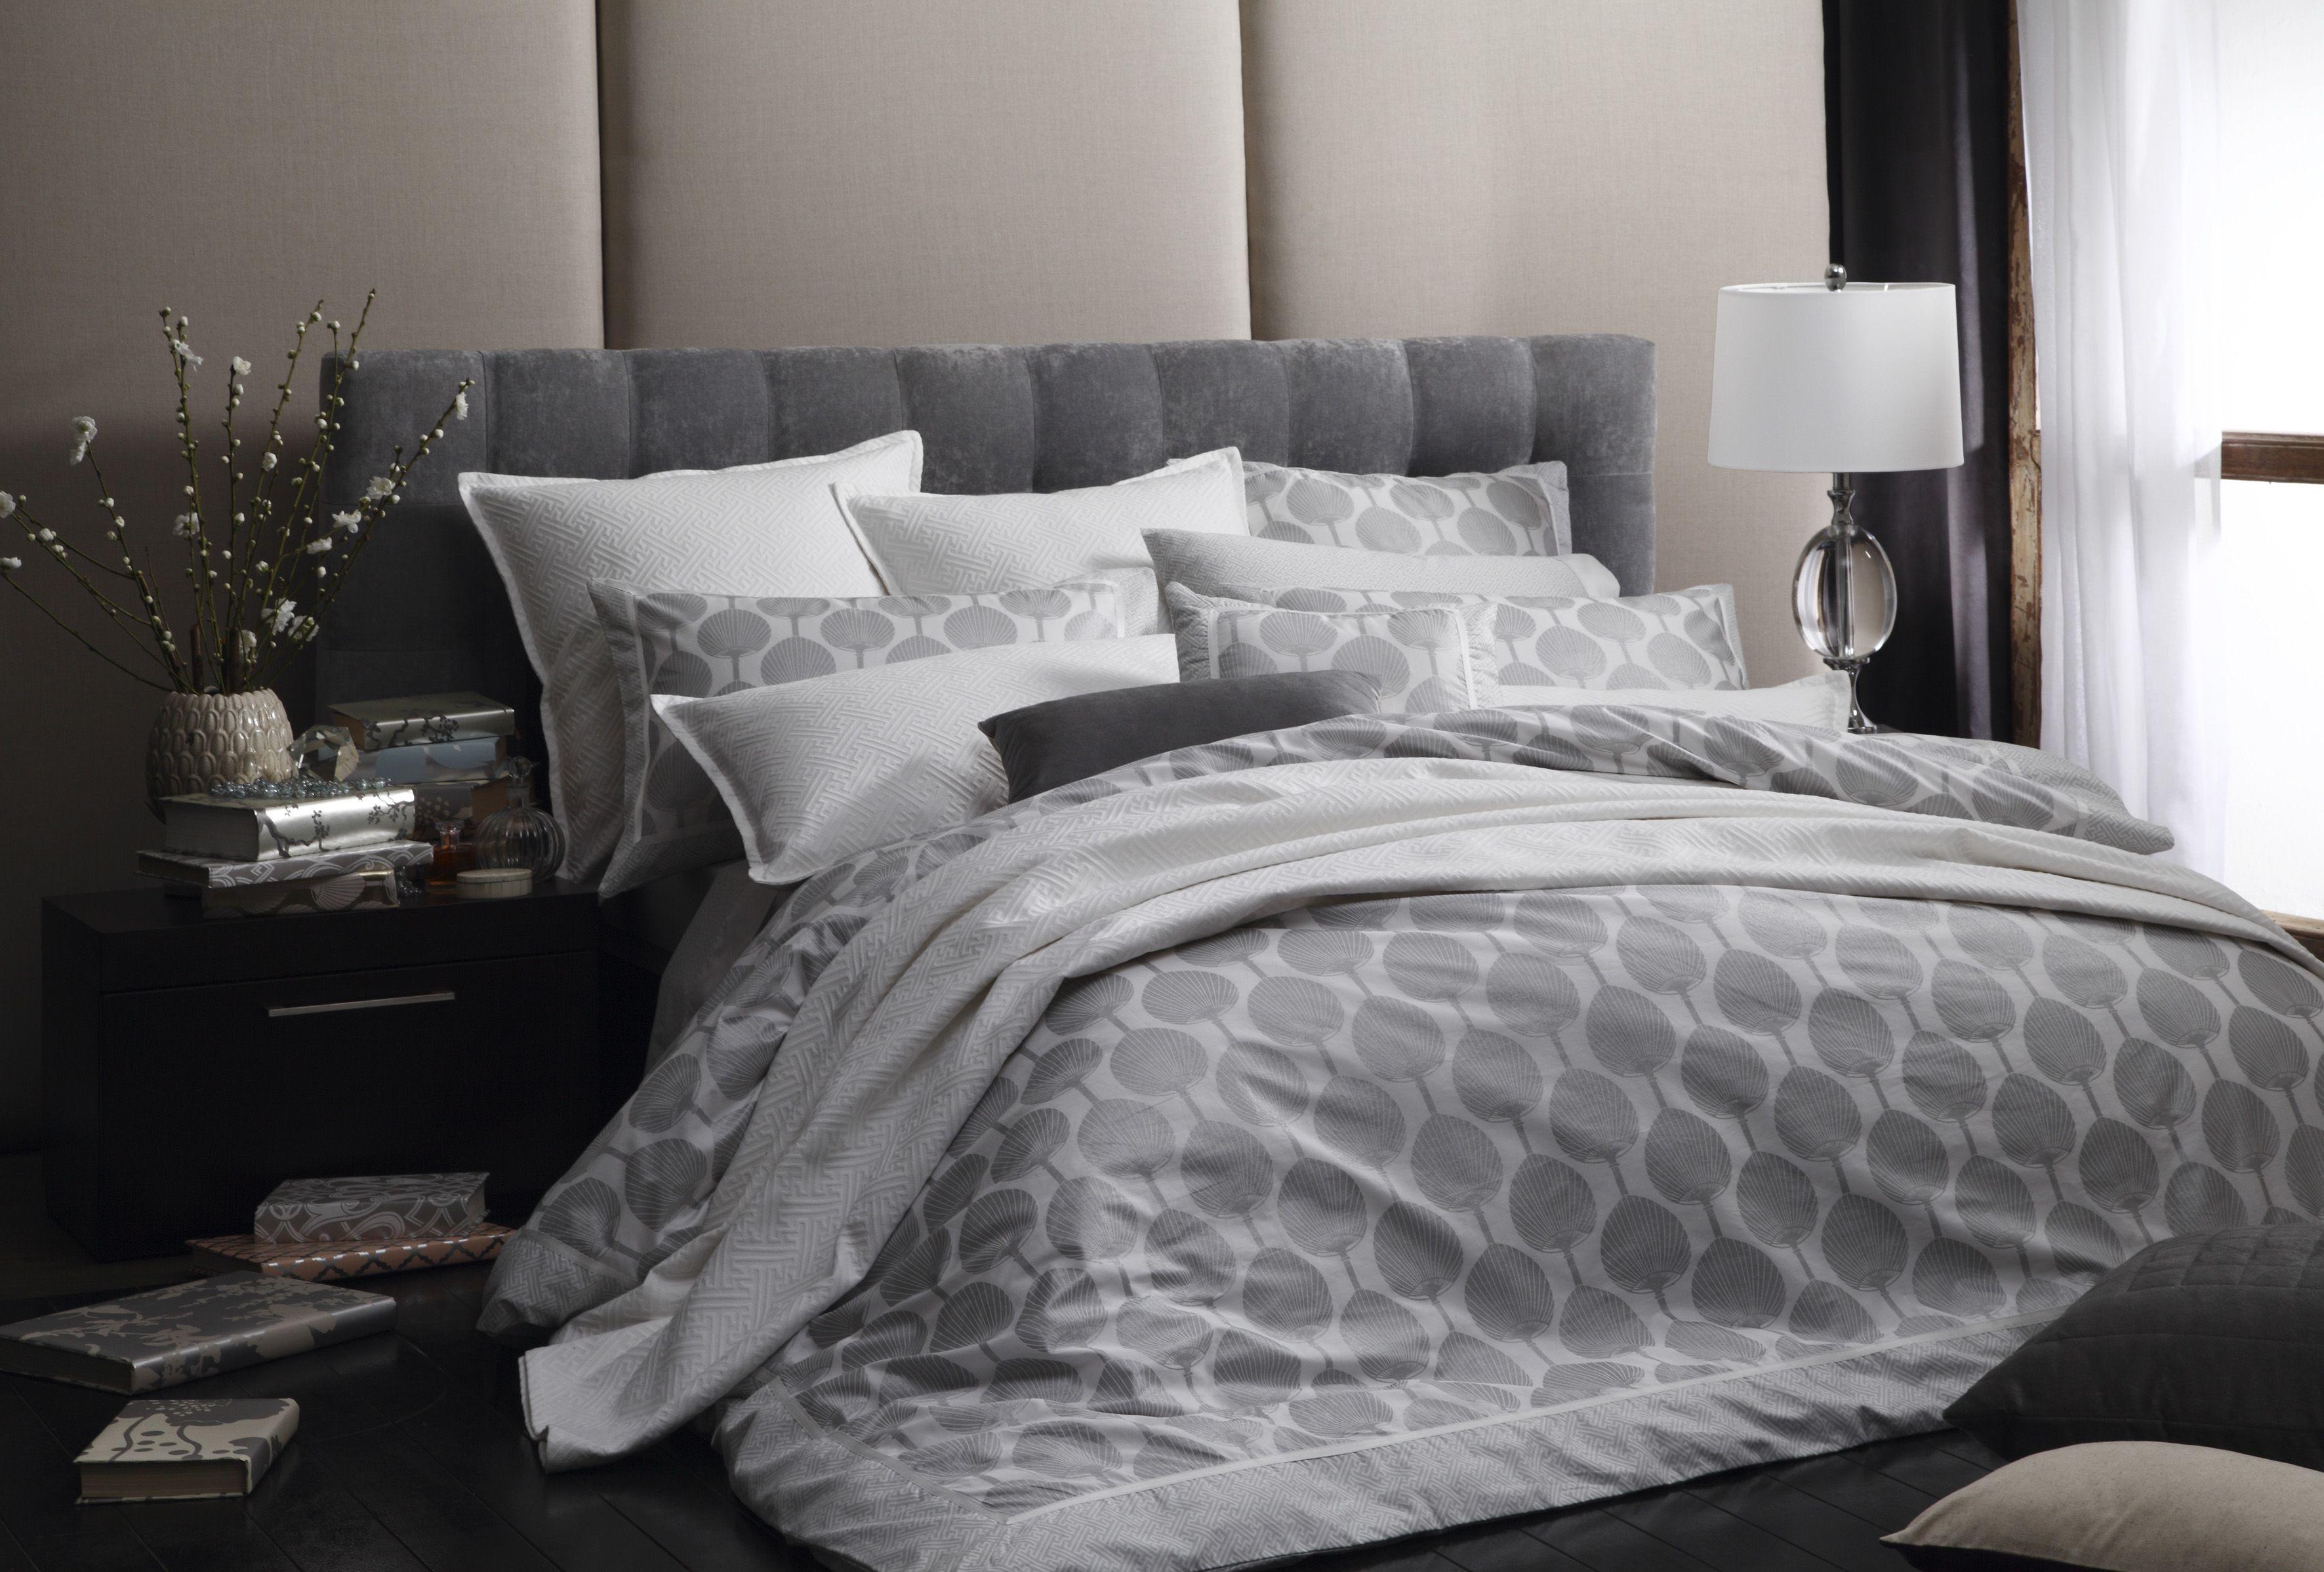 Florence Broadhurst patterns reborn as bed linen